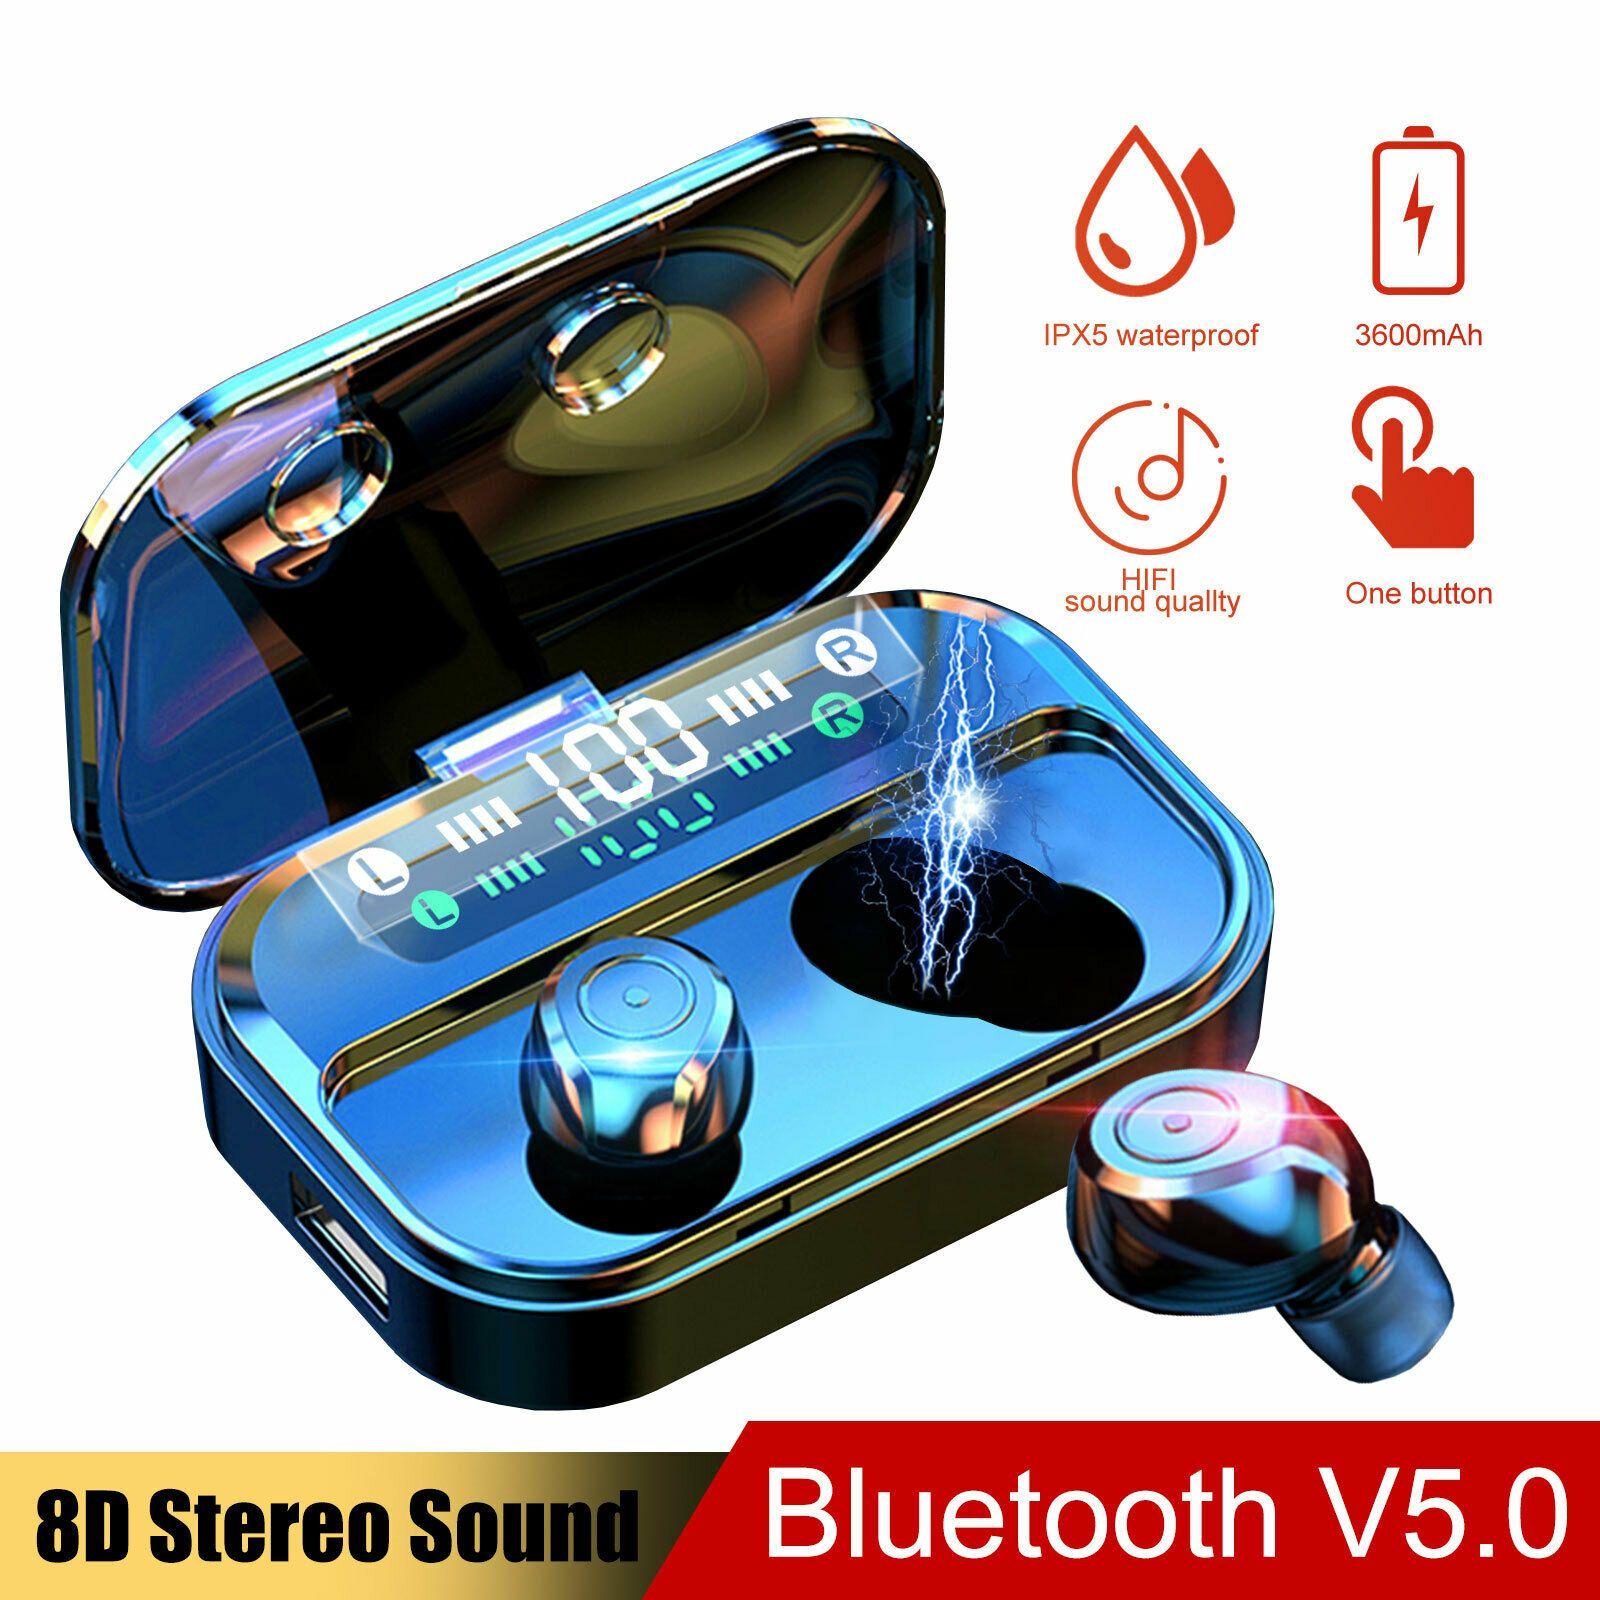 New Bluetooth 5 0 Headset Tws Wireless Earphones Mini Earbuds Stereo Headphones Ideas Of Hea In 2020 Wireless Headphones Wireless Earphones Bluetooth Earbuds Sports